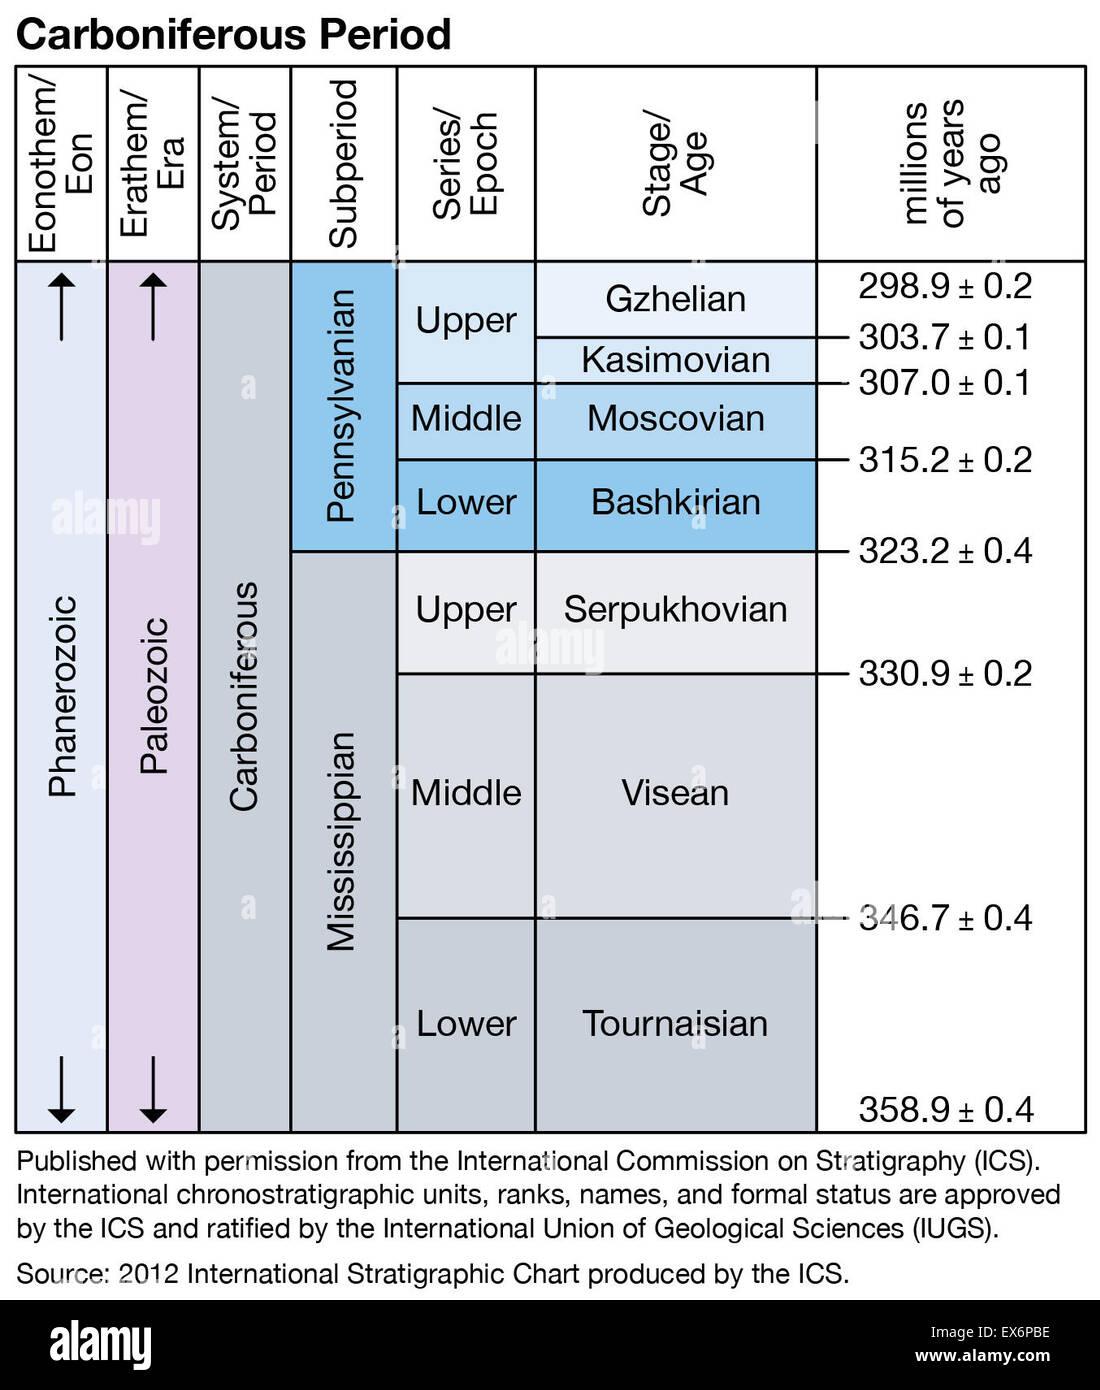 Carboniferous period Stock Photo